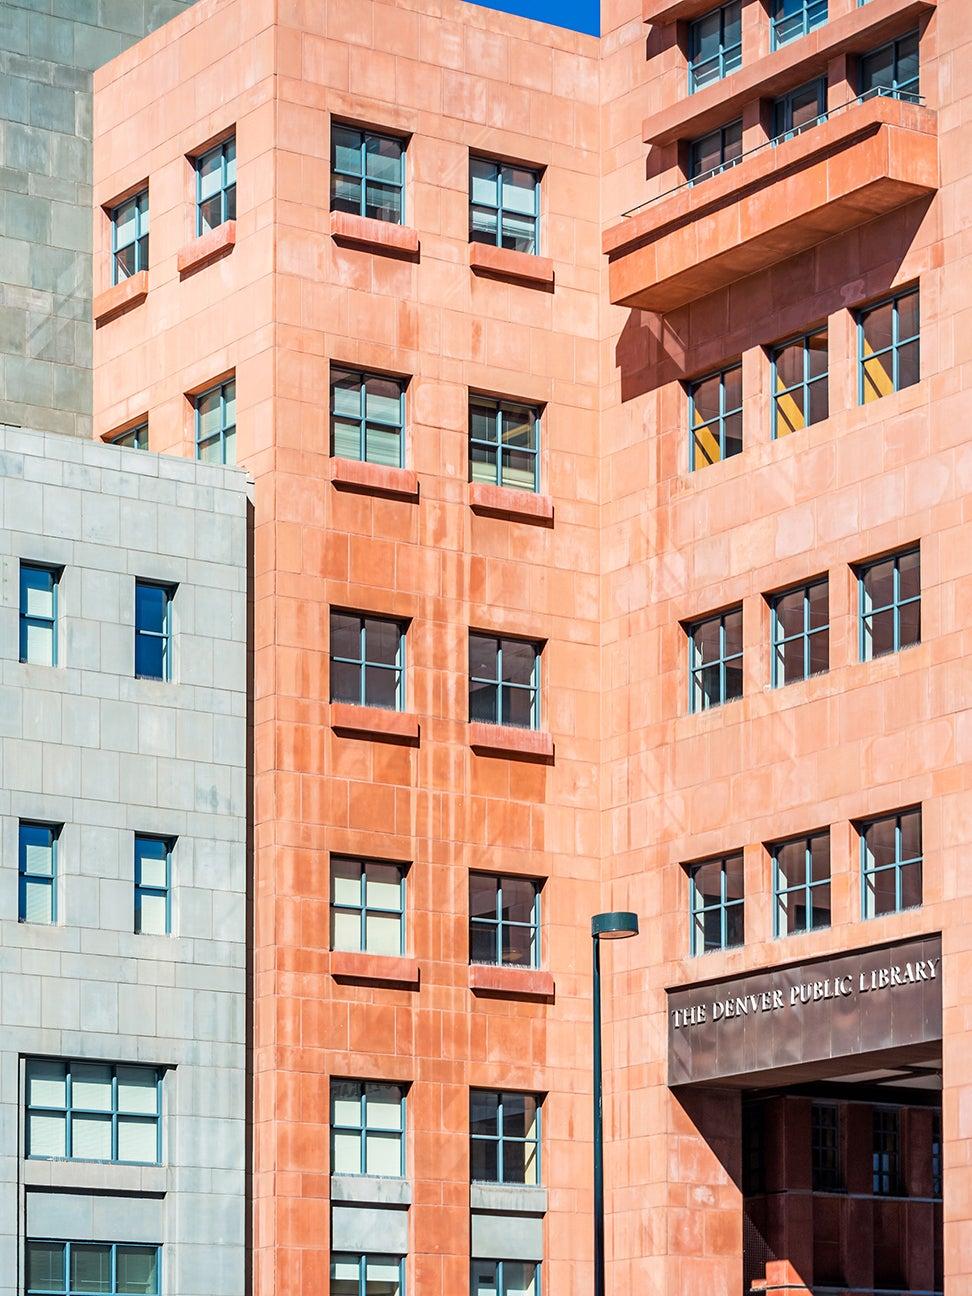 colorful buildings in Denver